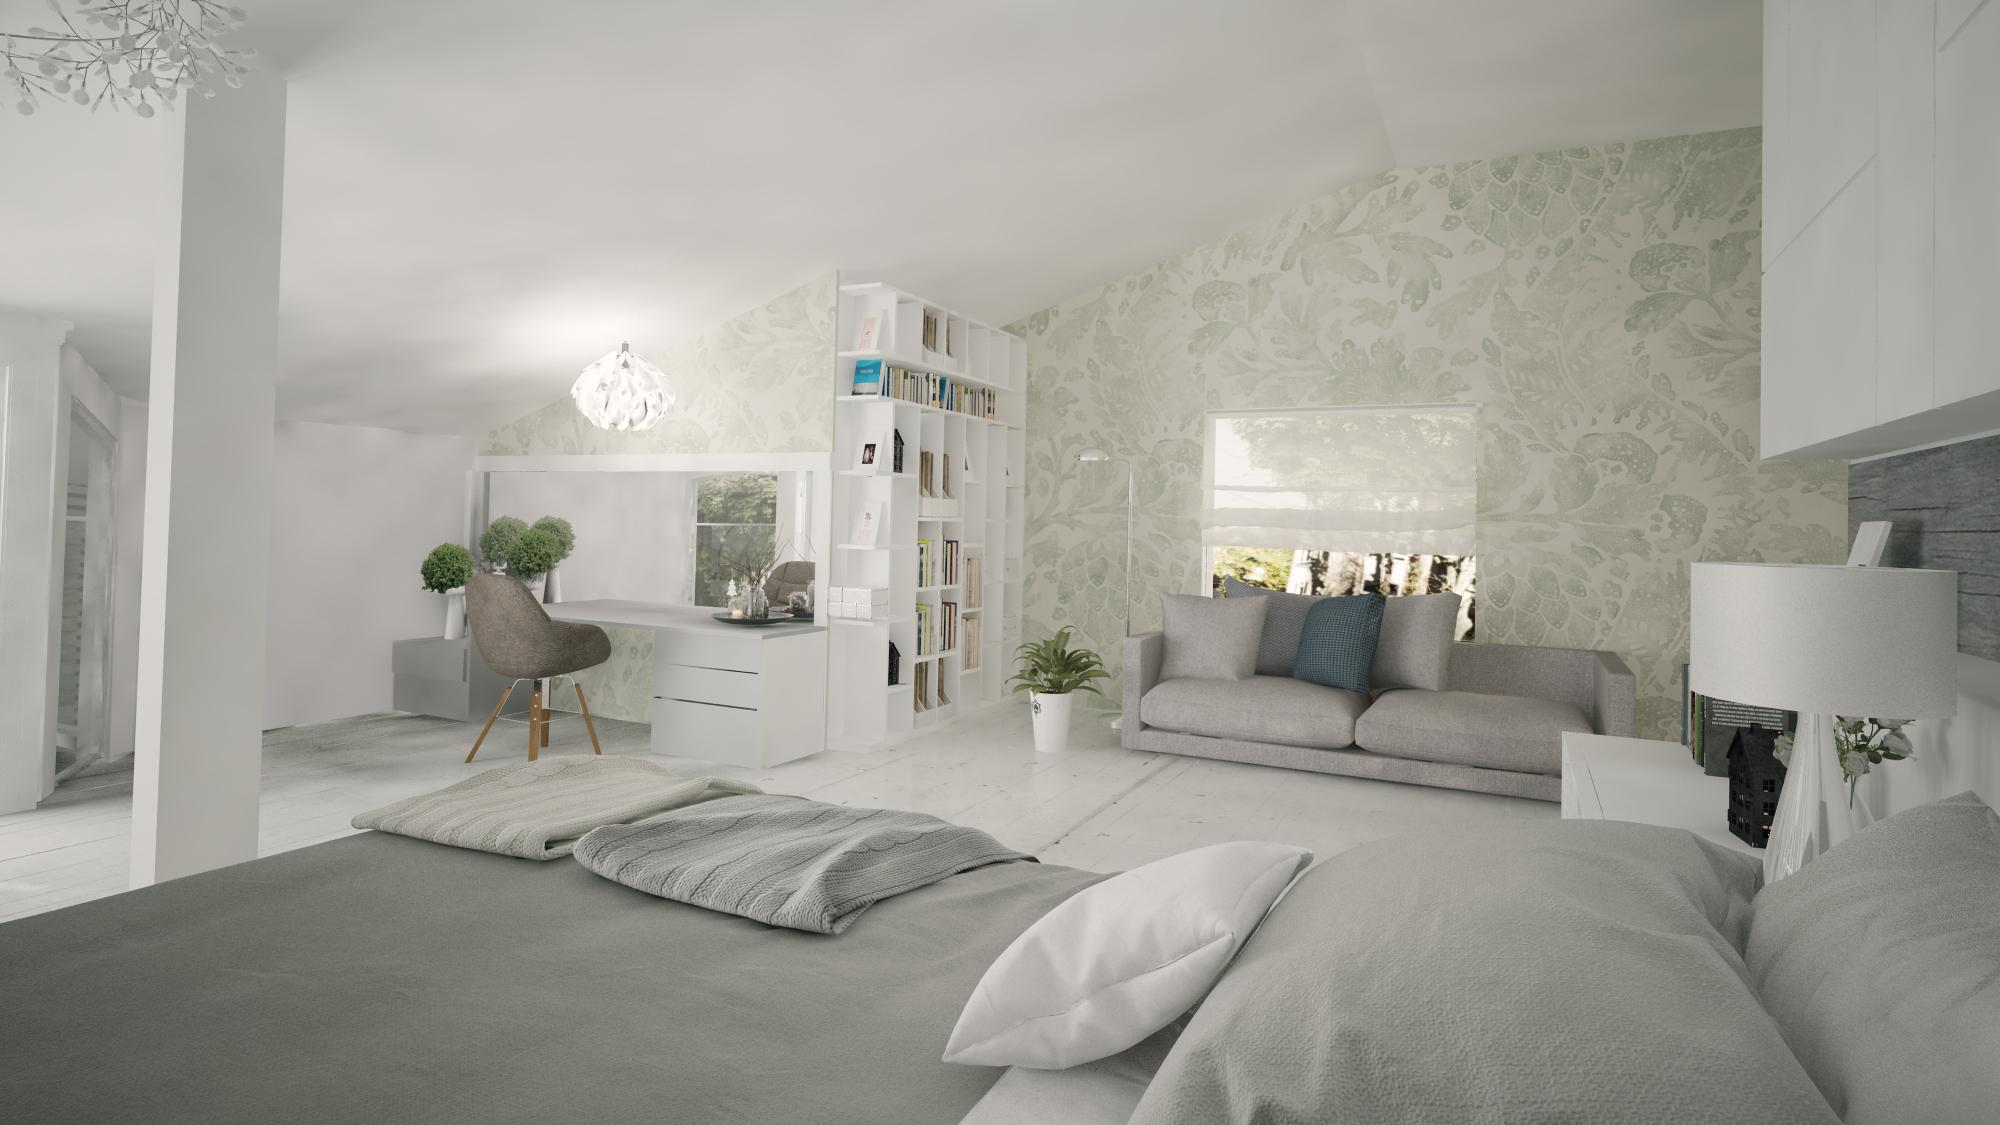 amenajare_mansarda_dormitor 5